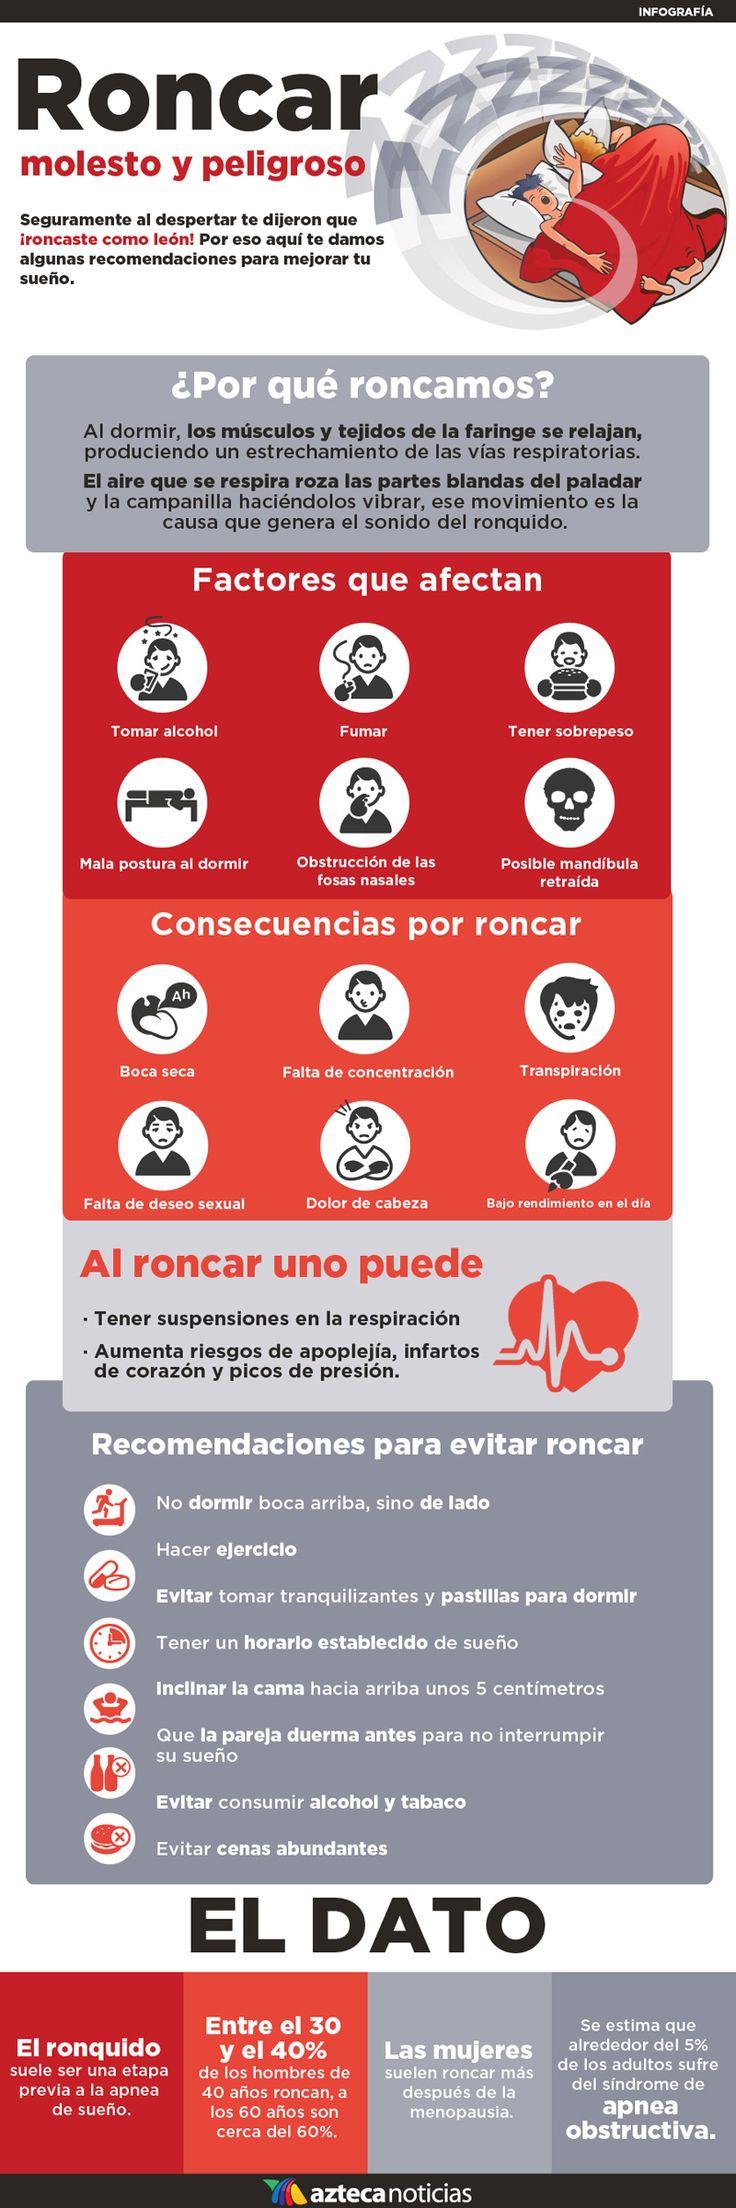 Roncar zzz molesto y peligroso #infografia